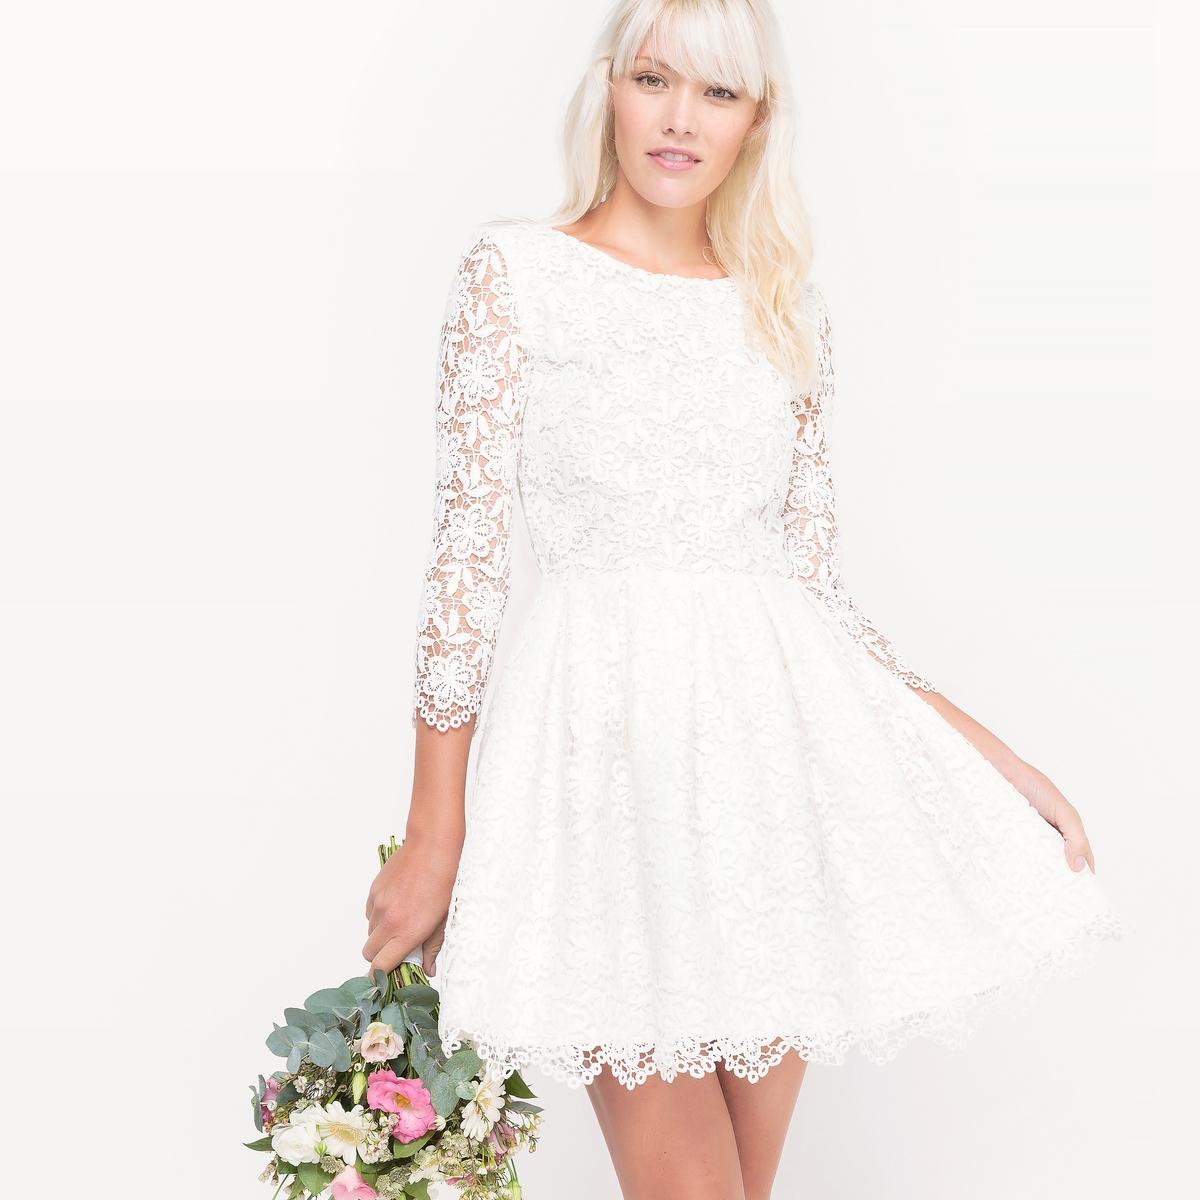 Платье свадебное короткое, из кружева свадебное платье prettycolor bridal 0331